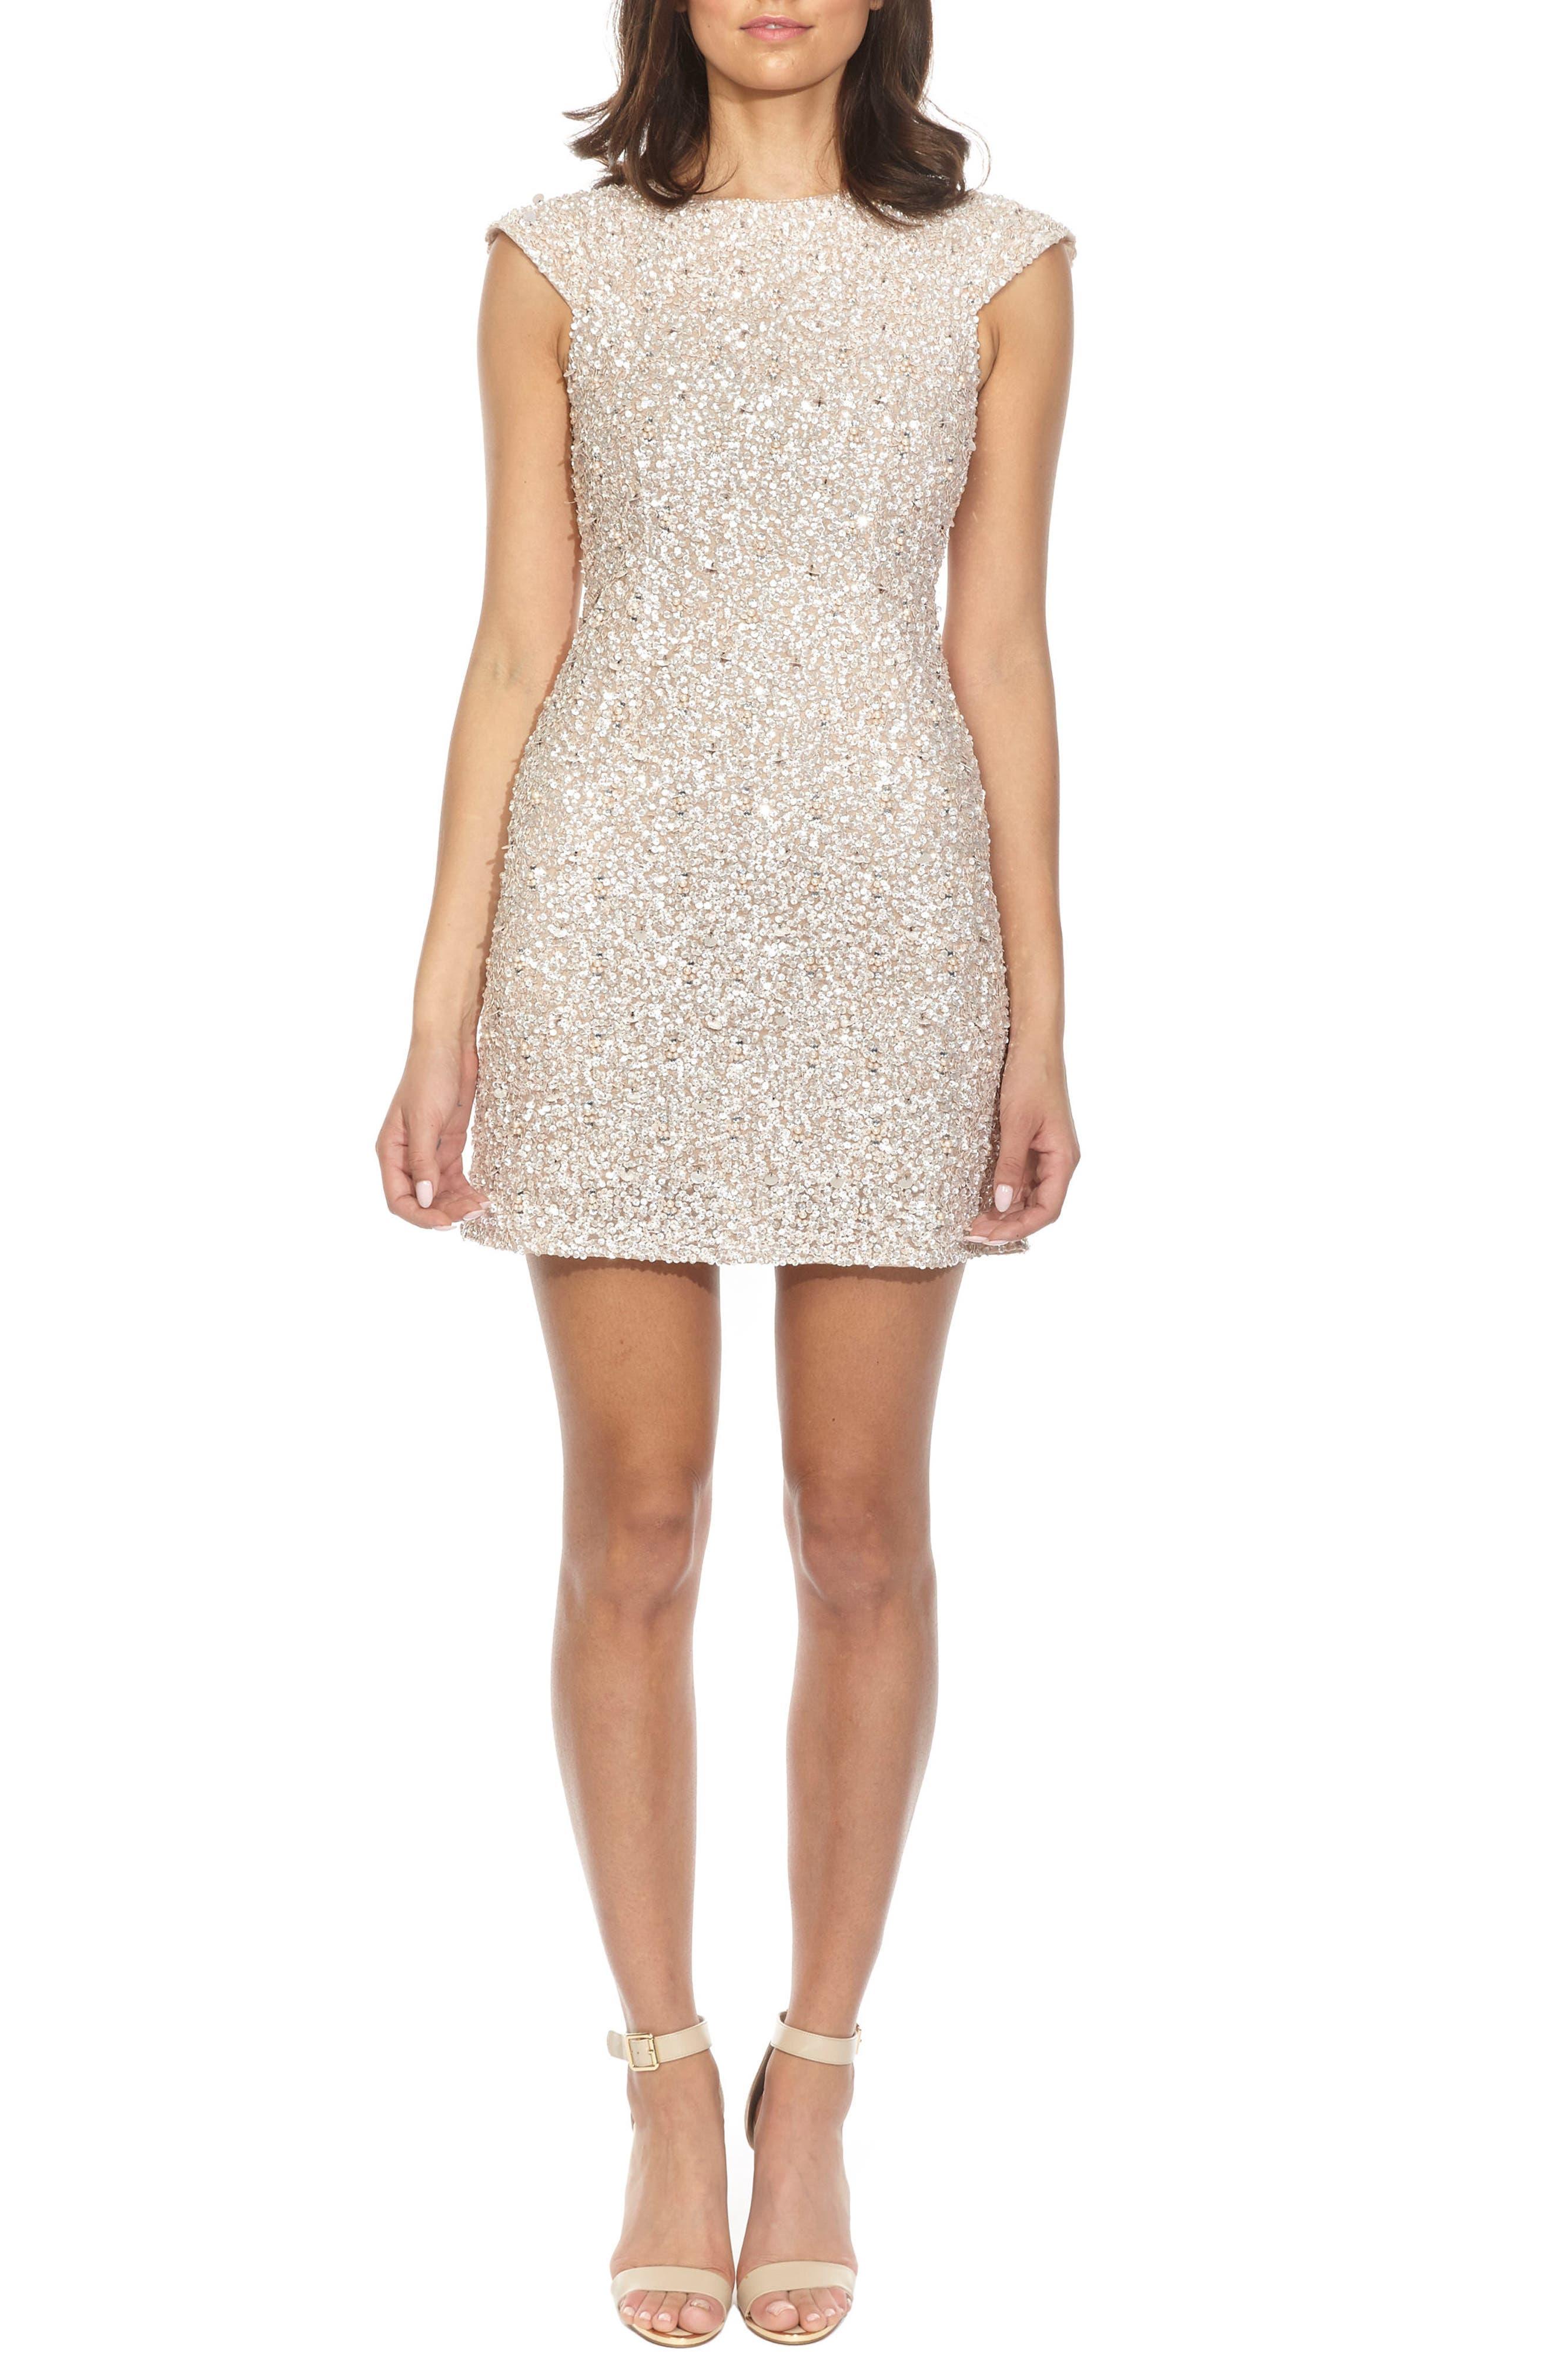 Pica Sequin Minidress,                             Main thumbnail 1, color,                             250